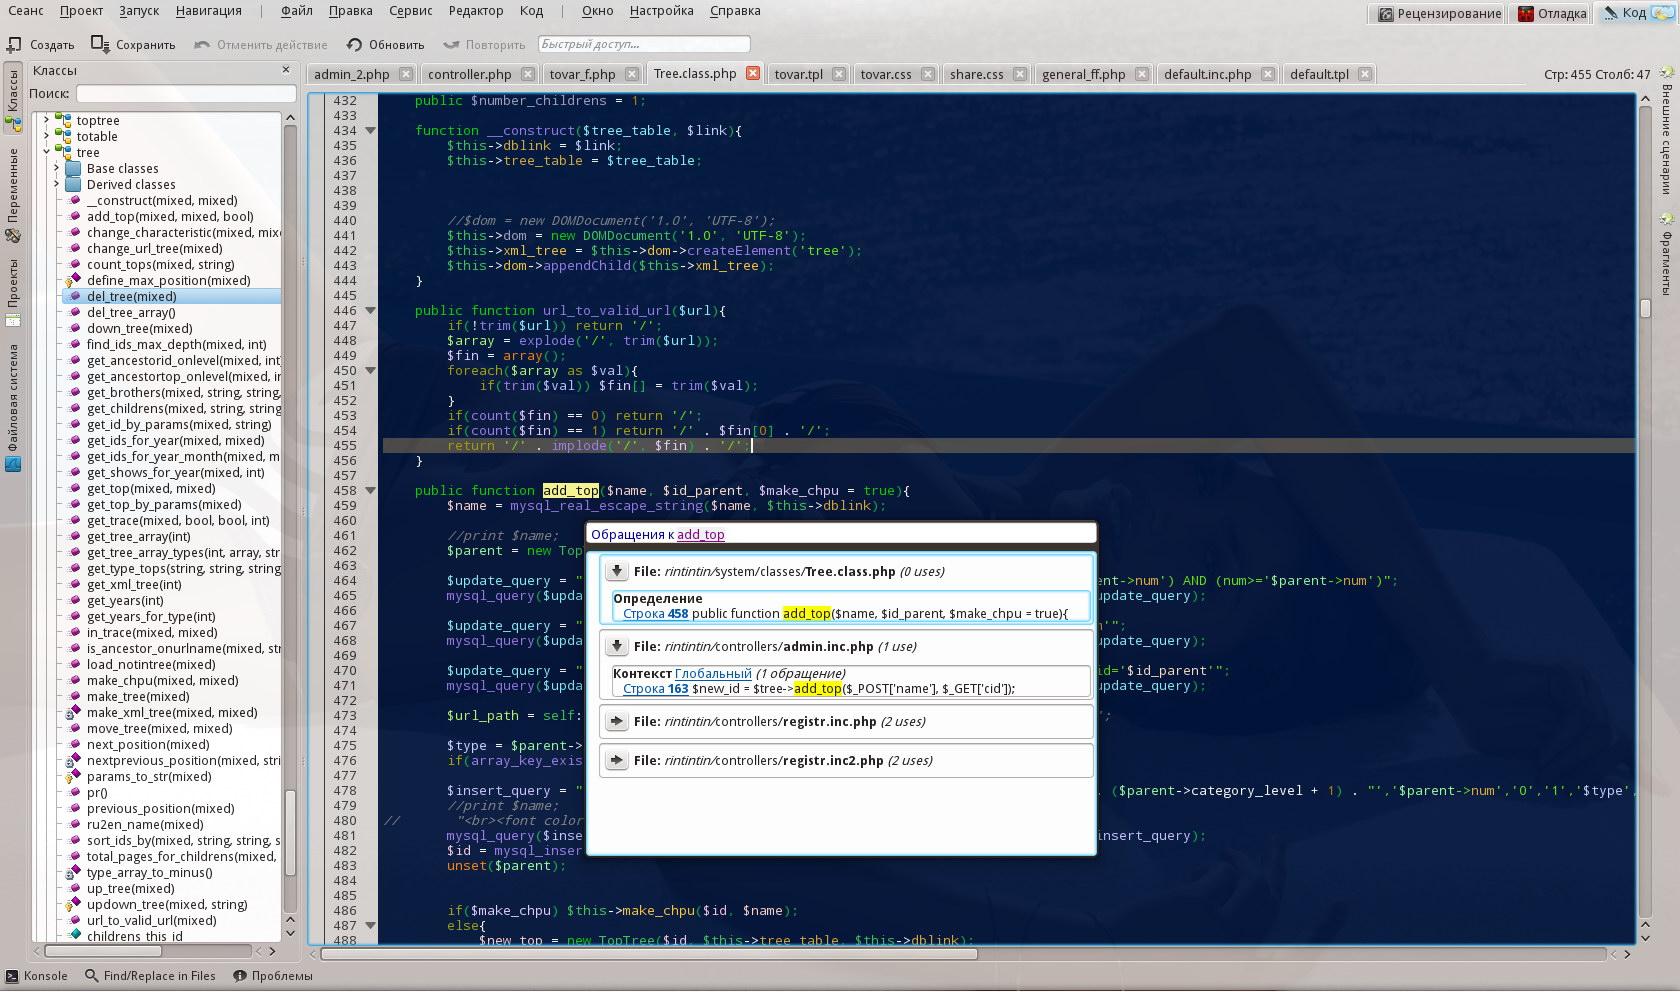 20+ Free IDES for Programmer - Hative